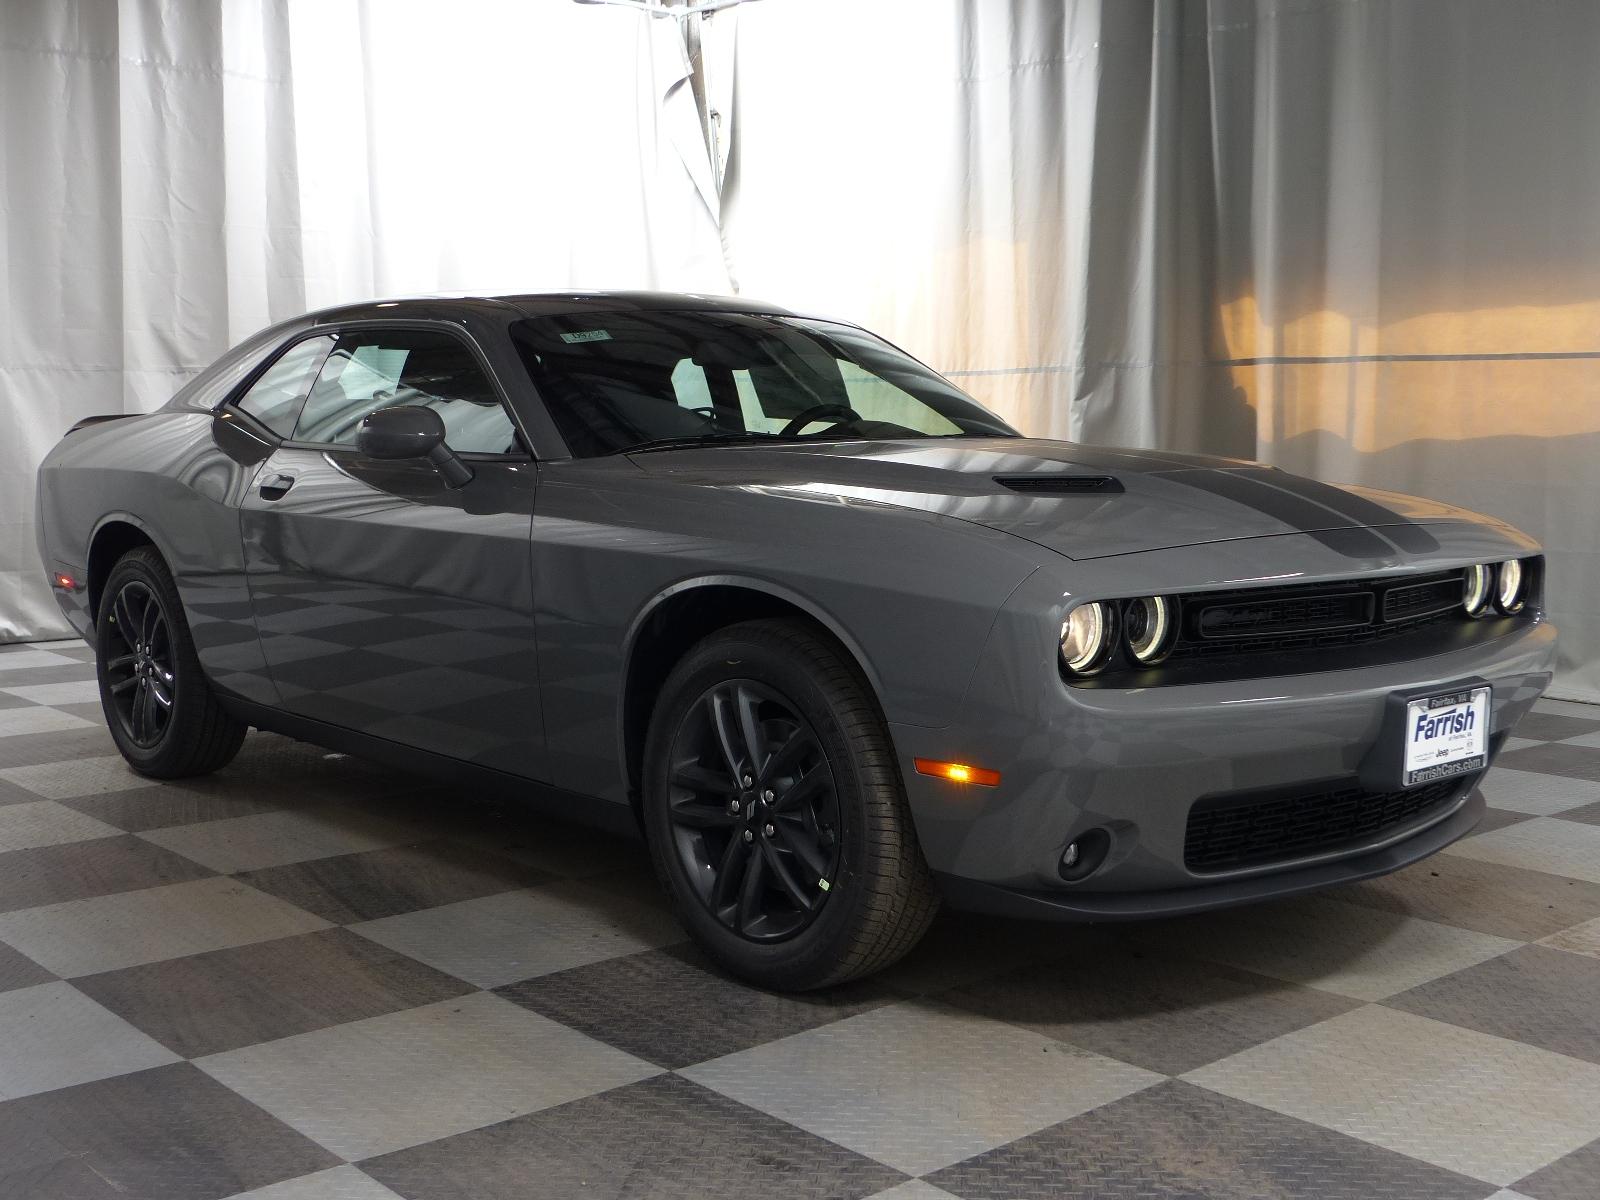 New 2019 Dodge Challenger SXT AWD gray clearcoat exterior black interior Stock D9254 VIN 2C3CD